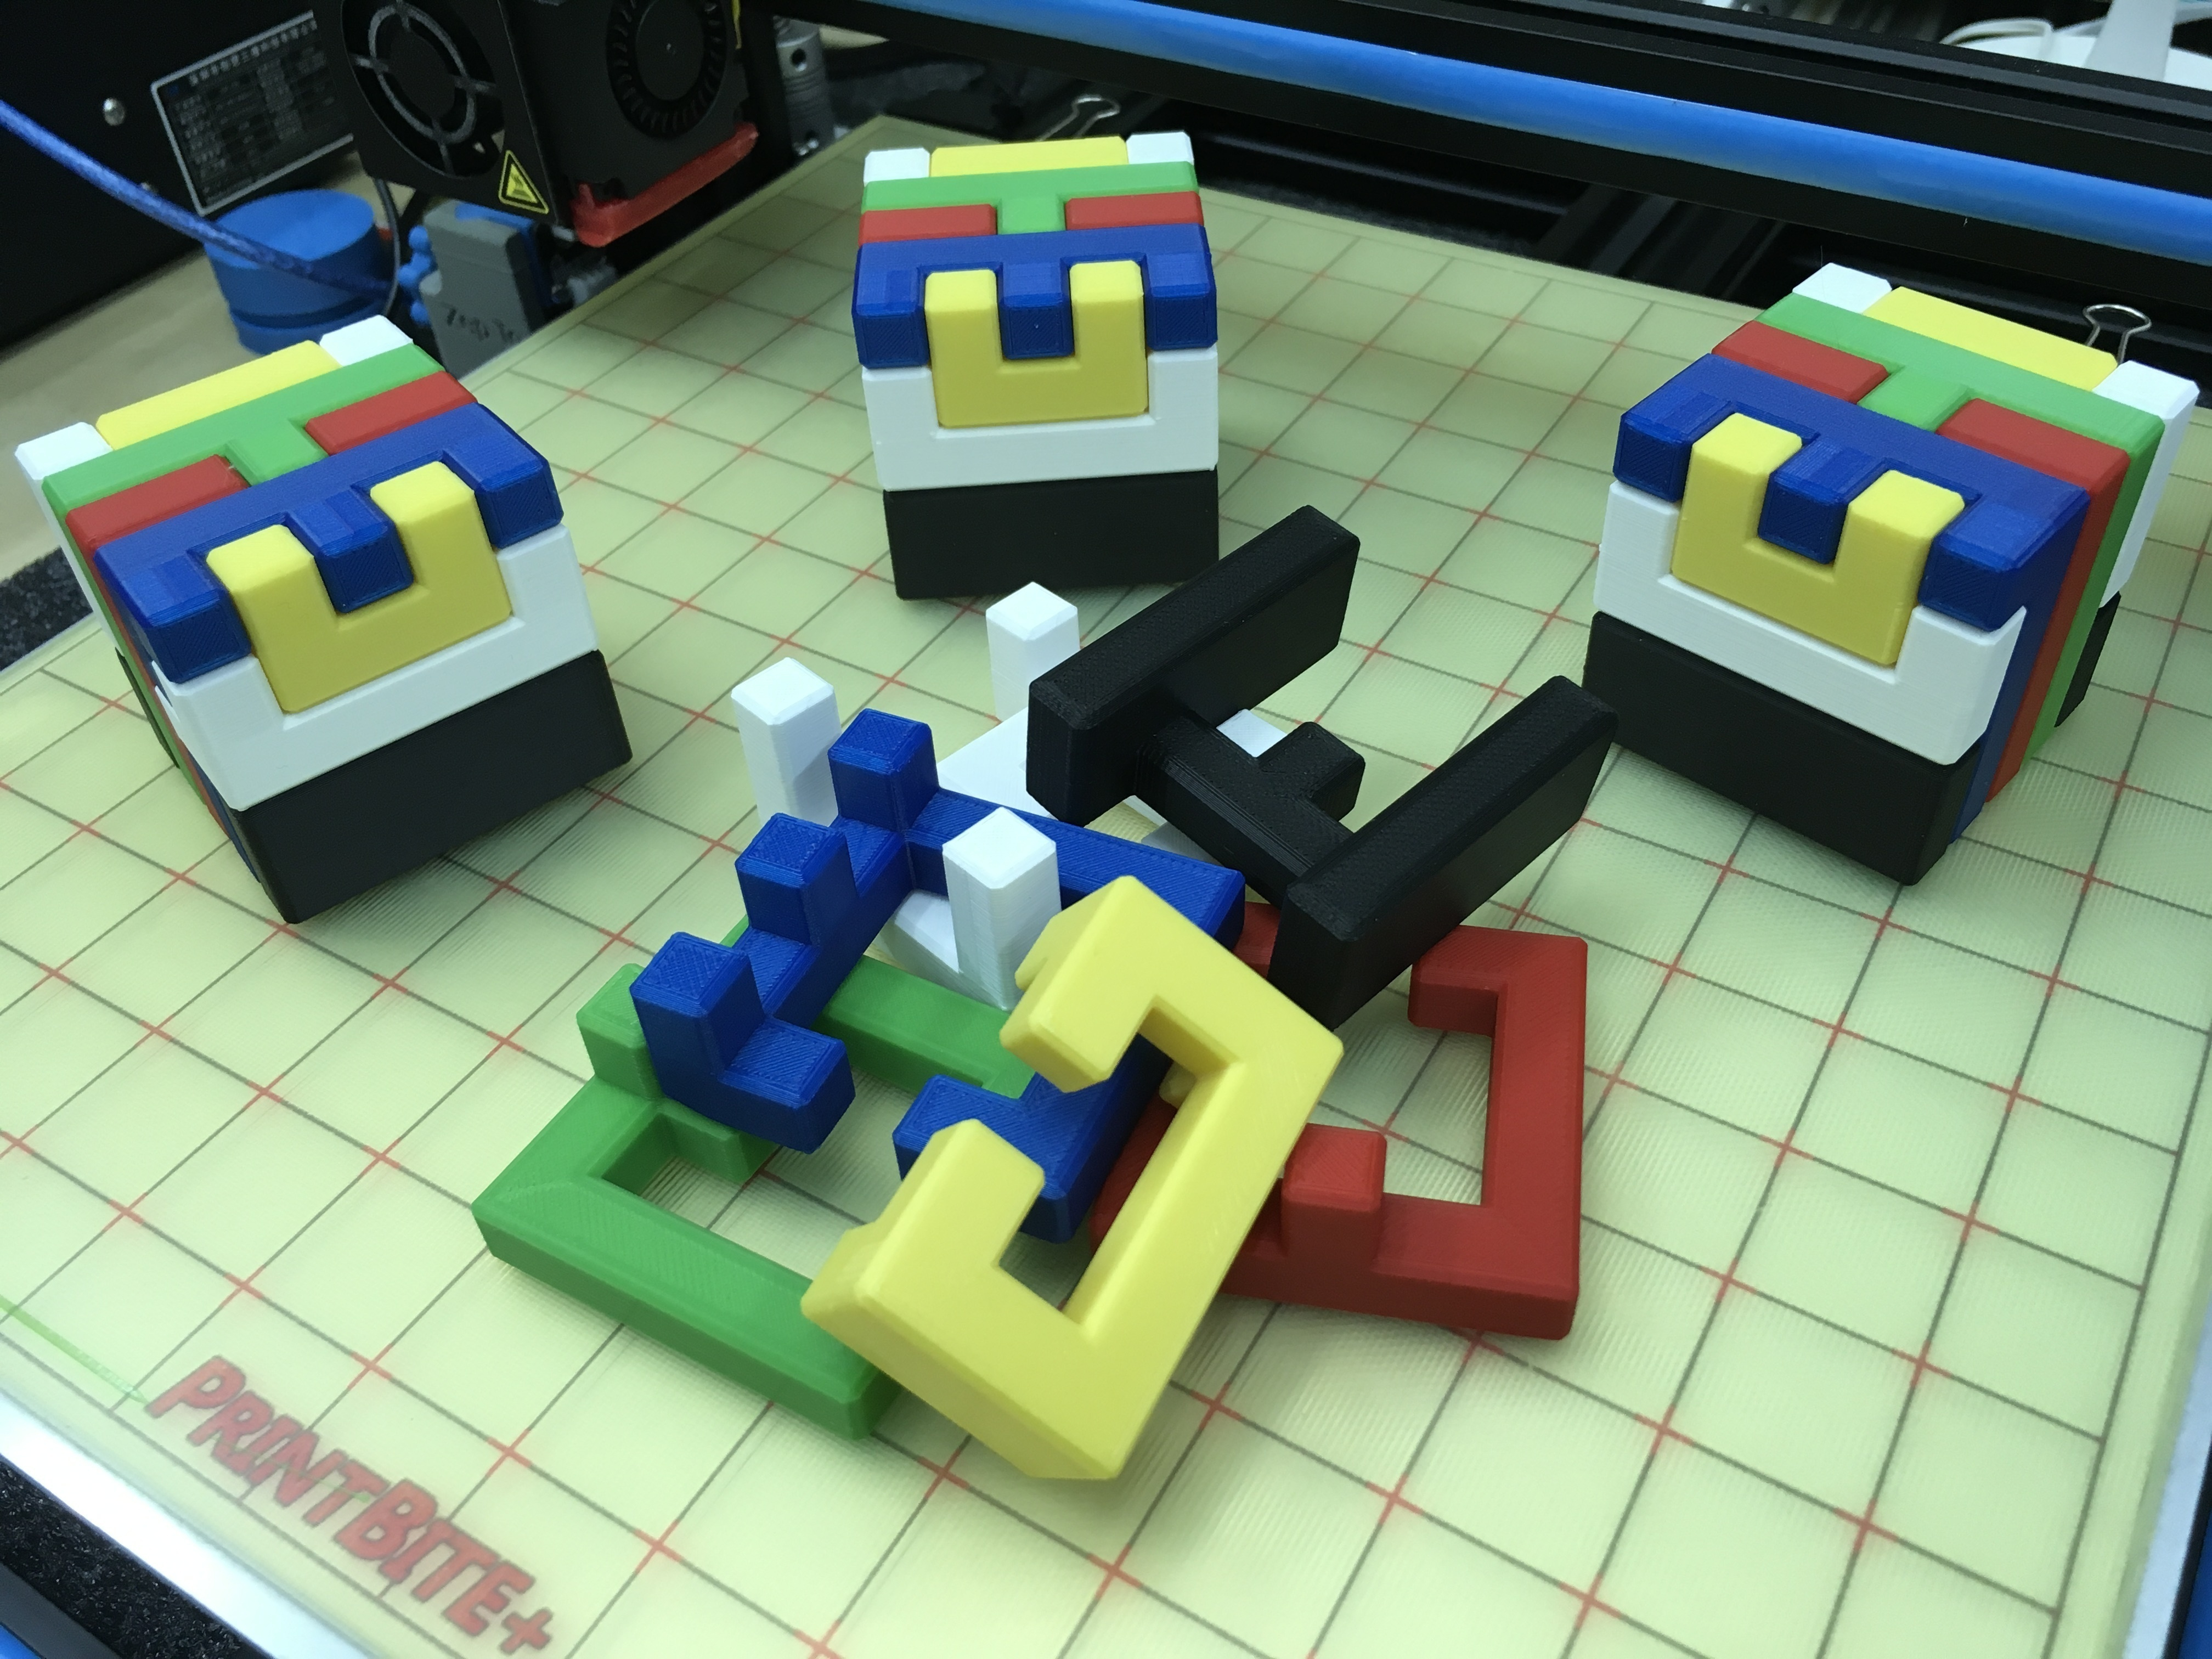 3D Printed Printable Interlocking Puzzle #4 - Level 11Richgain - 3D Printable Puzzles